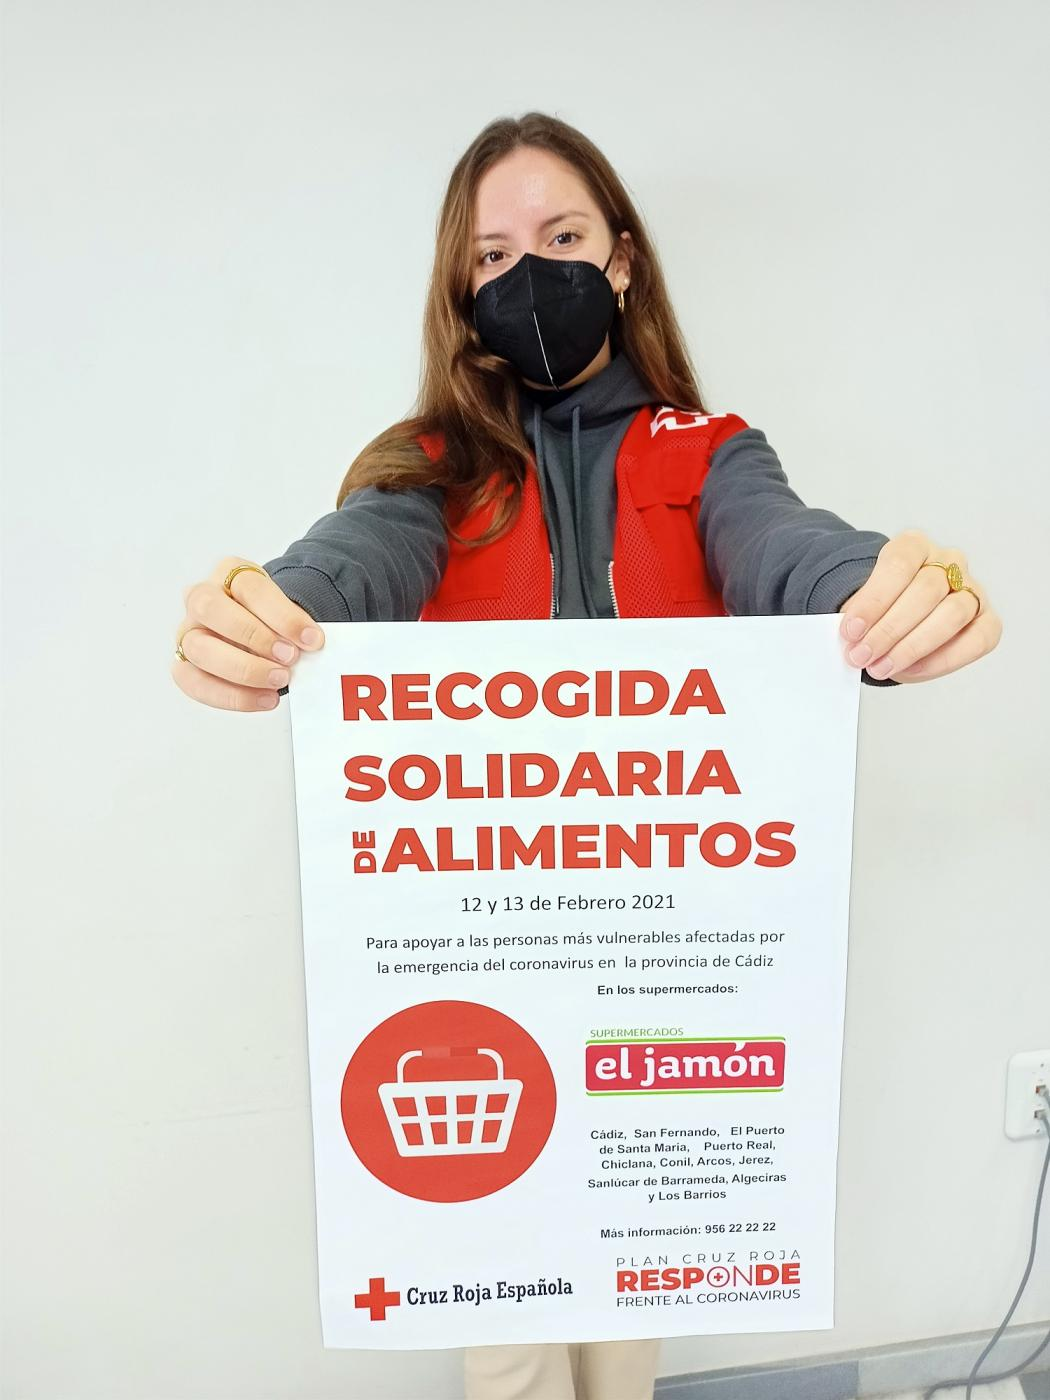 Recogida de alimentos de Cruz Roja.